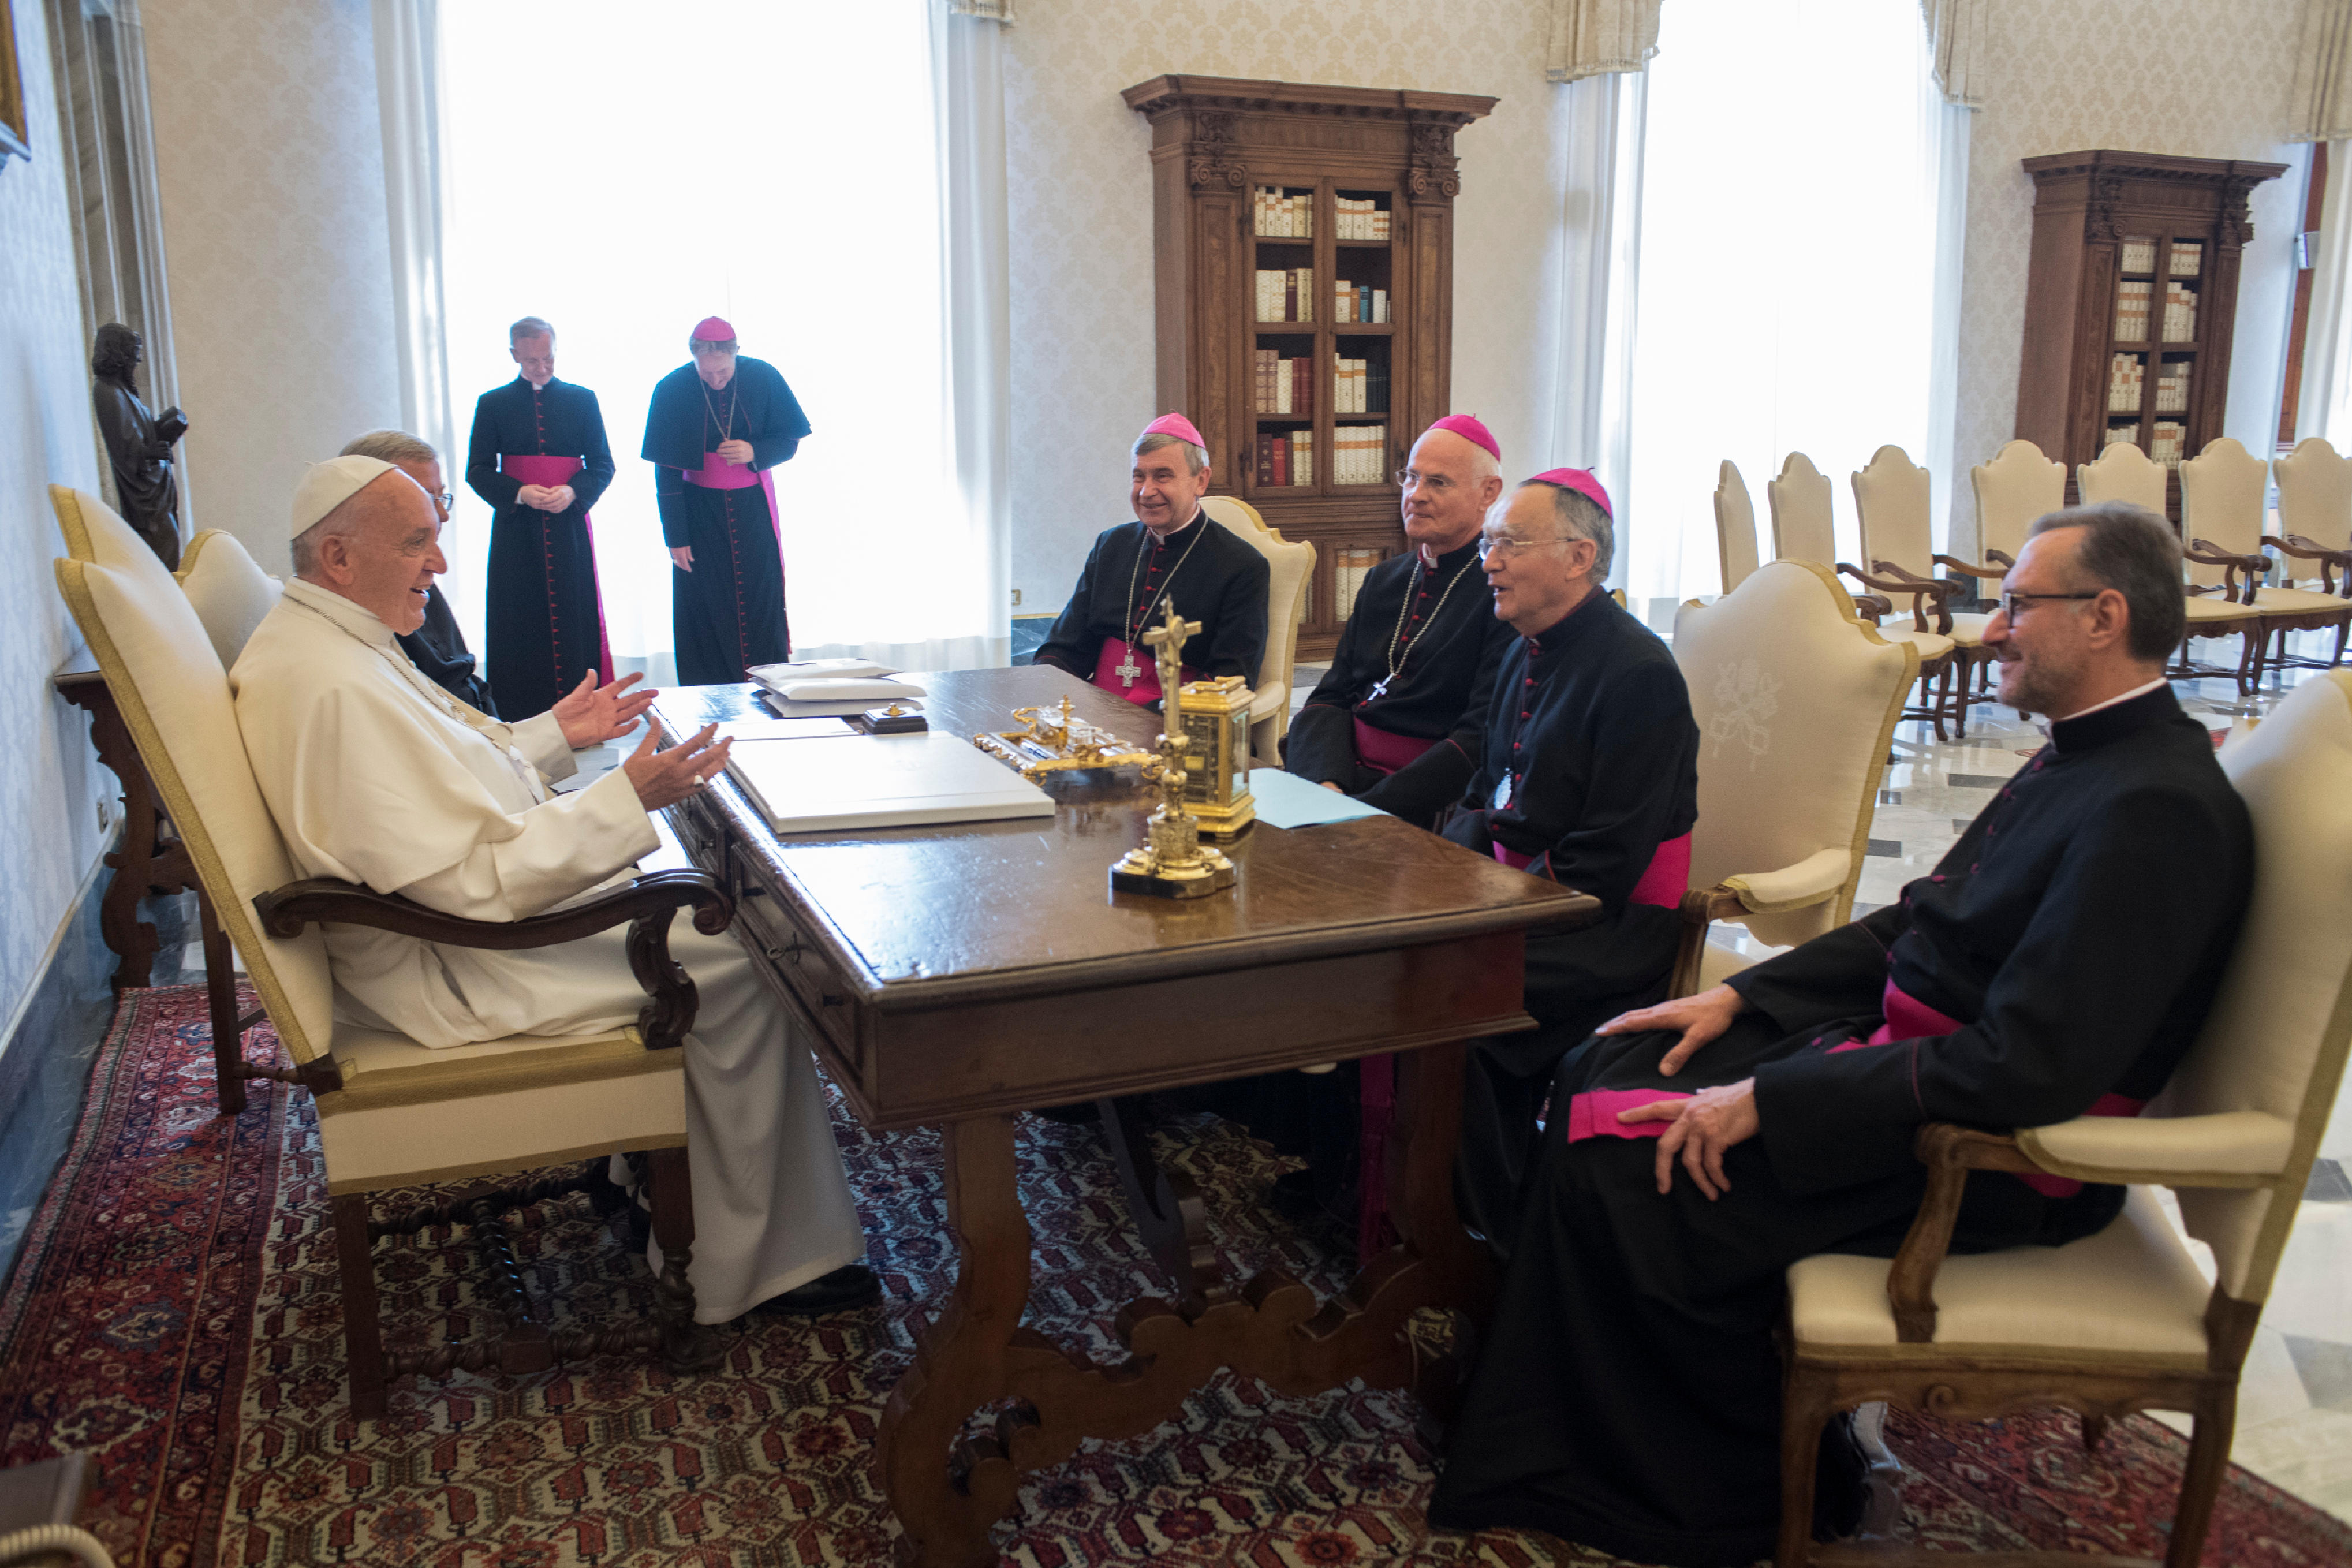 Mgr Delannoy, Mgr Carré, Mgr Pontier, Mgr Ribadeau Dumas, 11/05/2017 @ L'Osservatore Romano